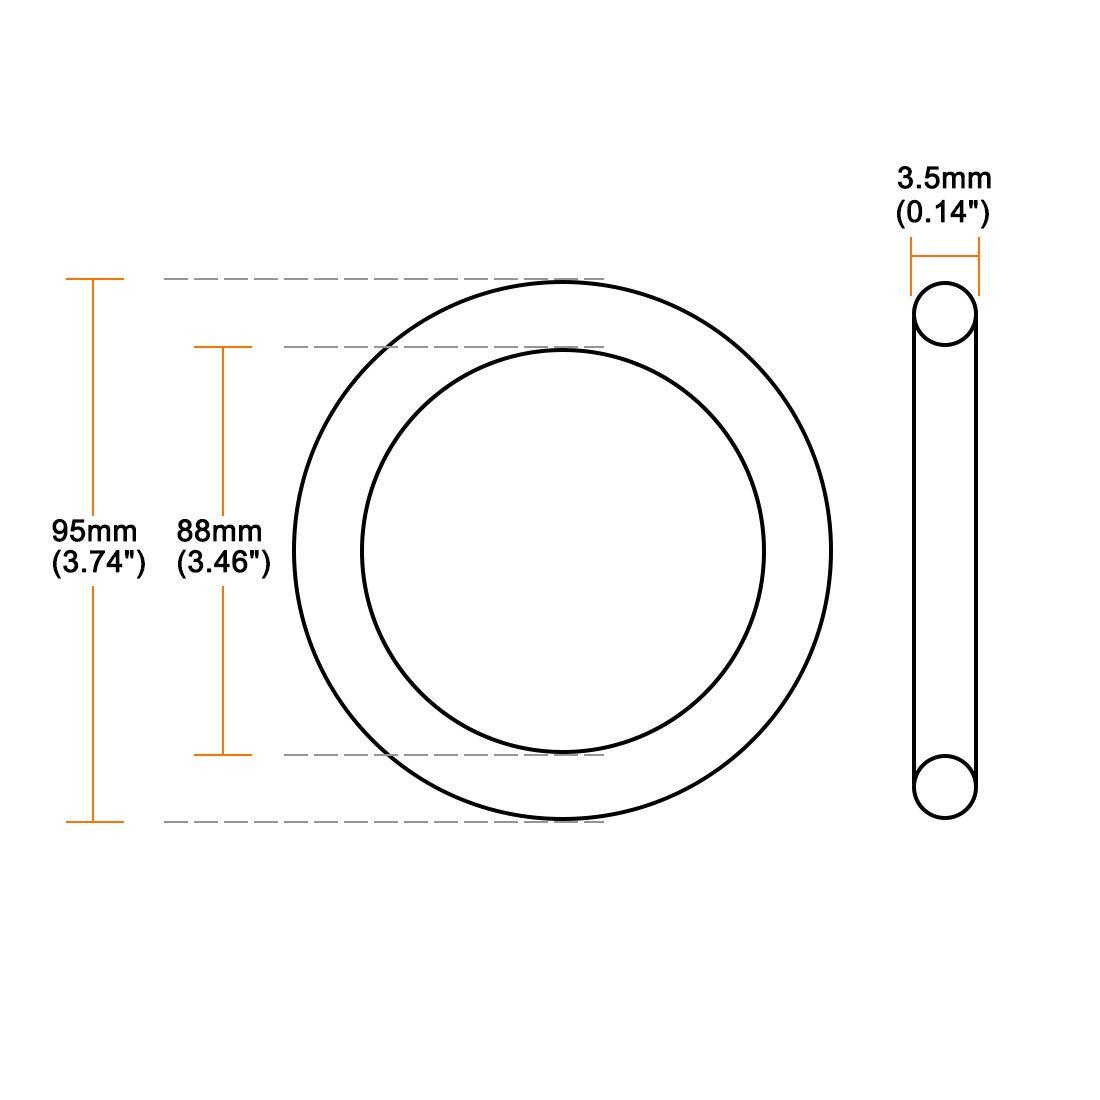 Joint torique caoutchouc nitrile ID 69mm OD 76mm large 3.5mm joint rond 5pc